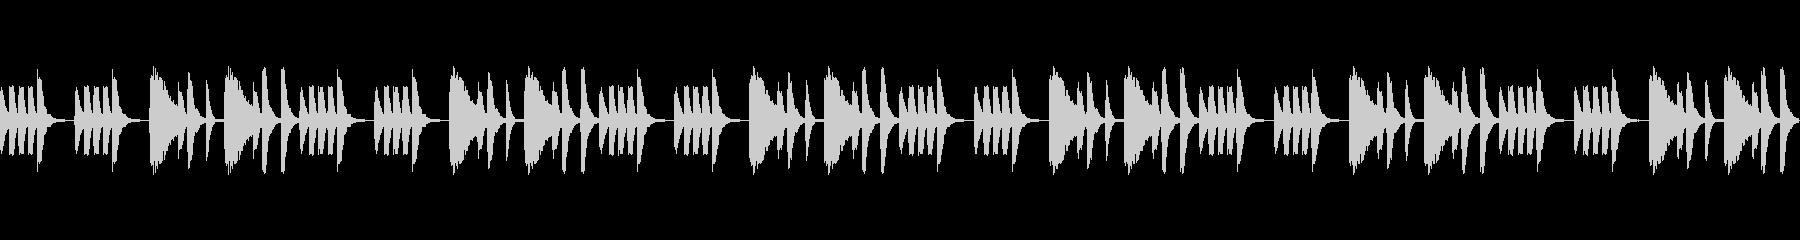 YouTuberの雑談BGMの未再生の波形